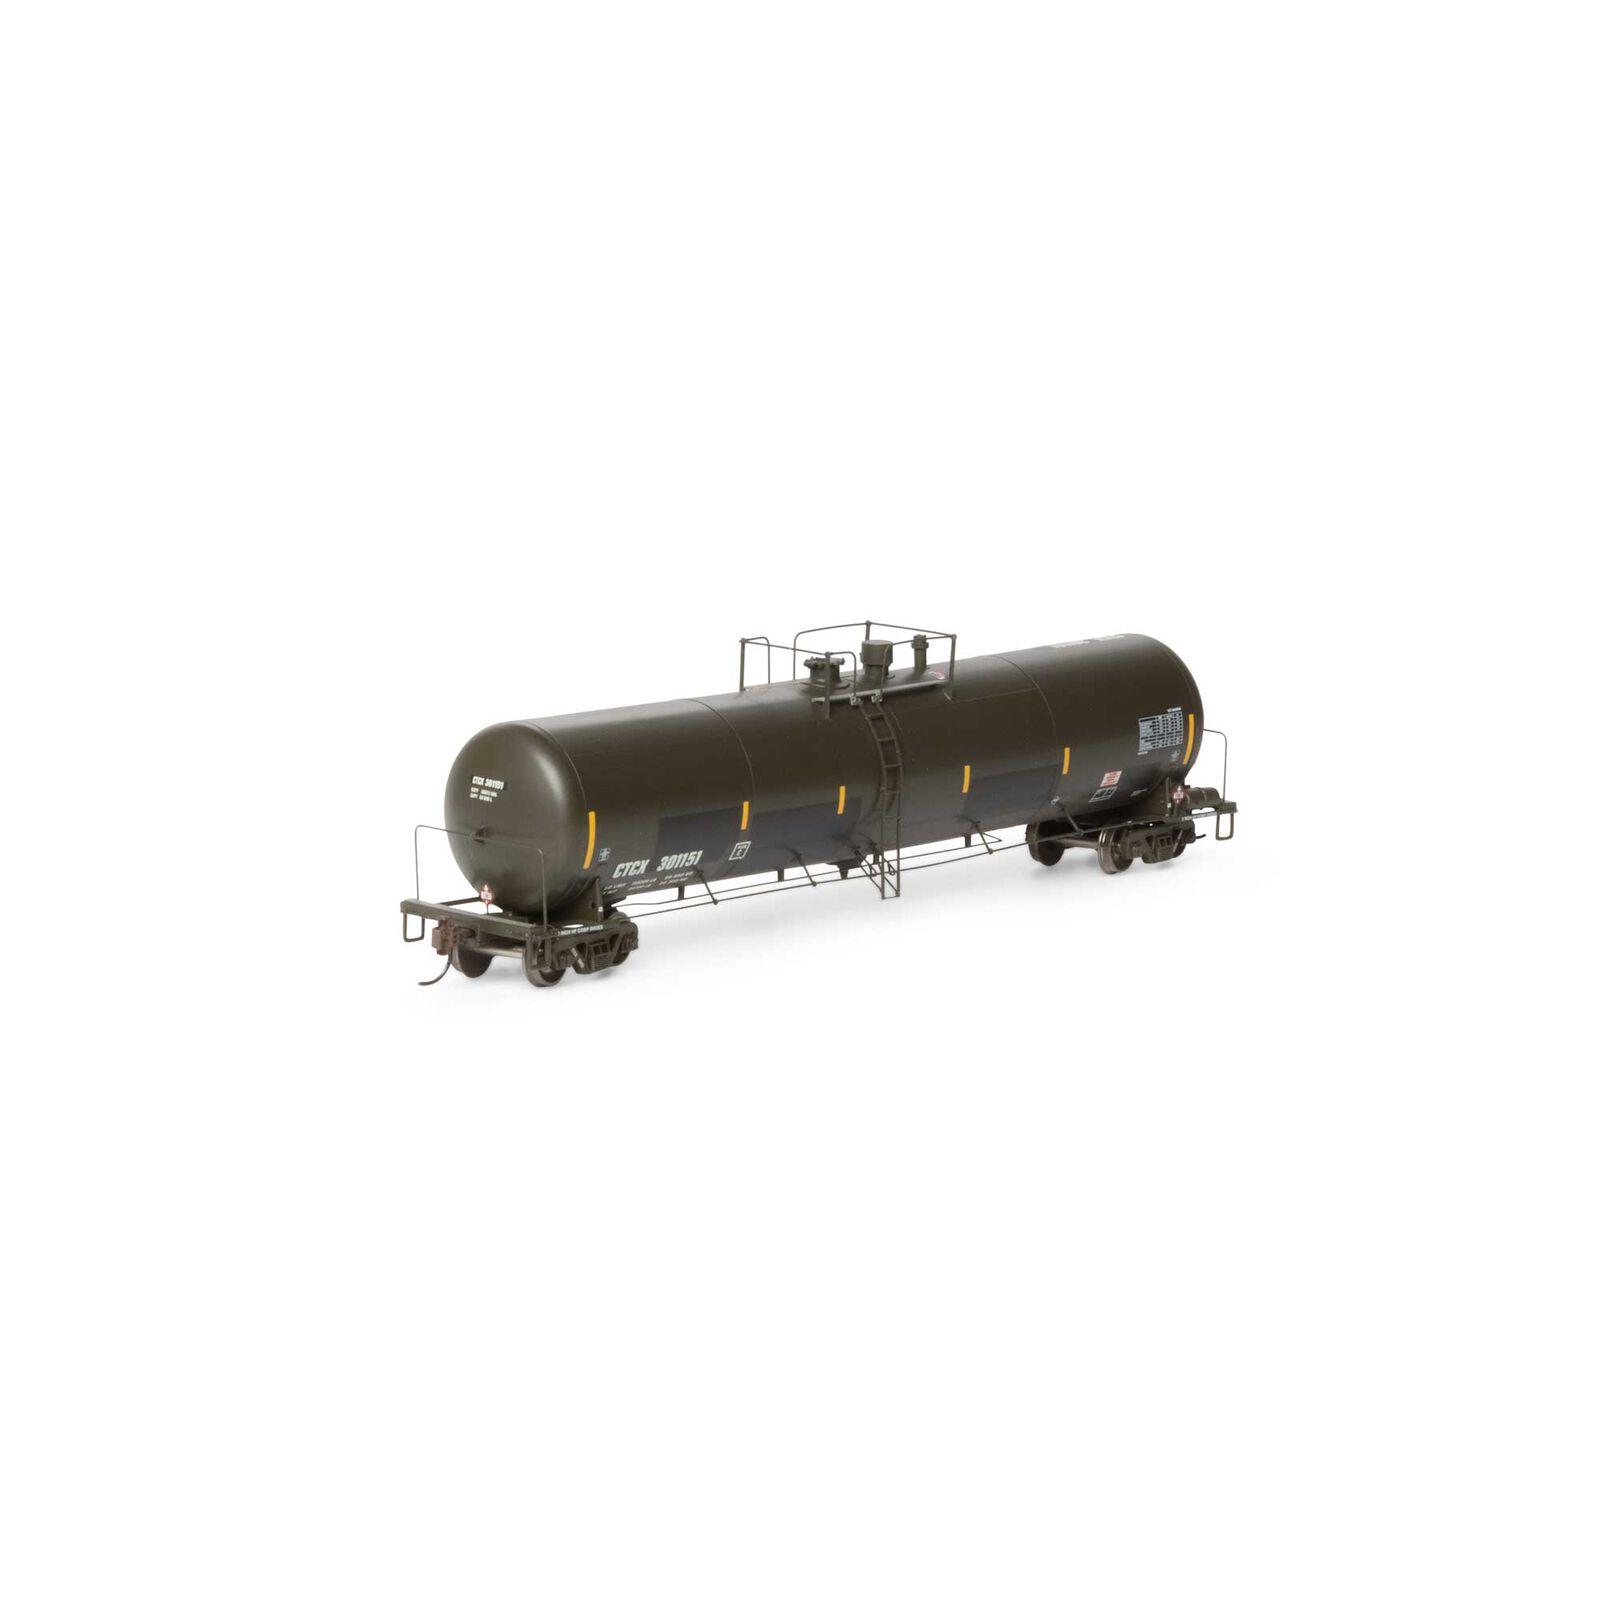 HO RTR 30 000 Gallon Ethanol Tank CTCX #301151